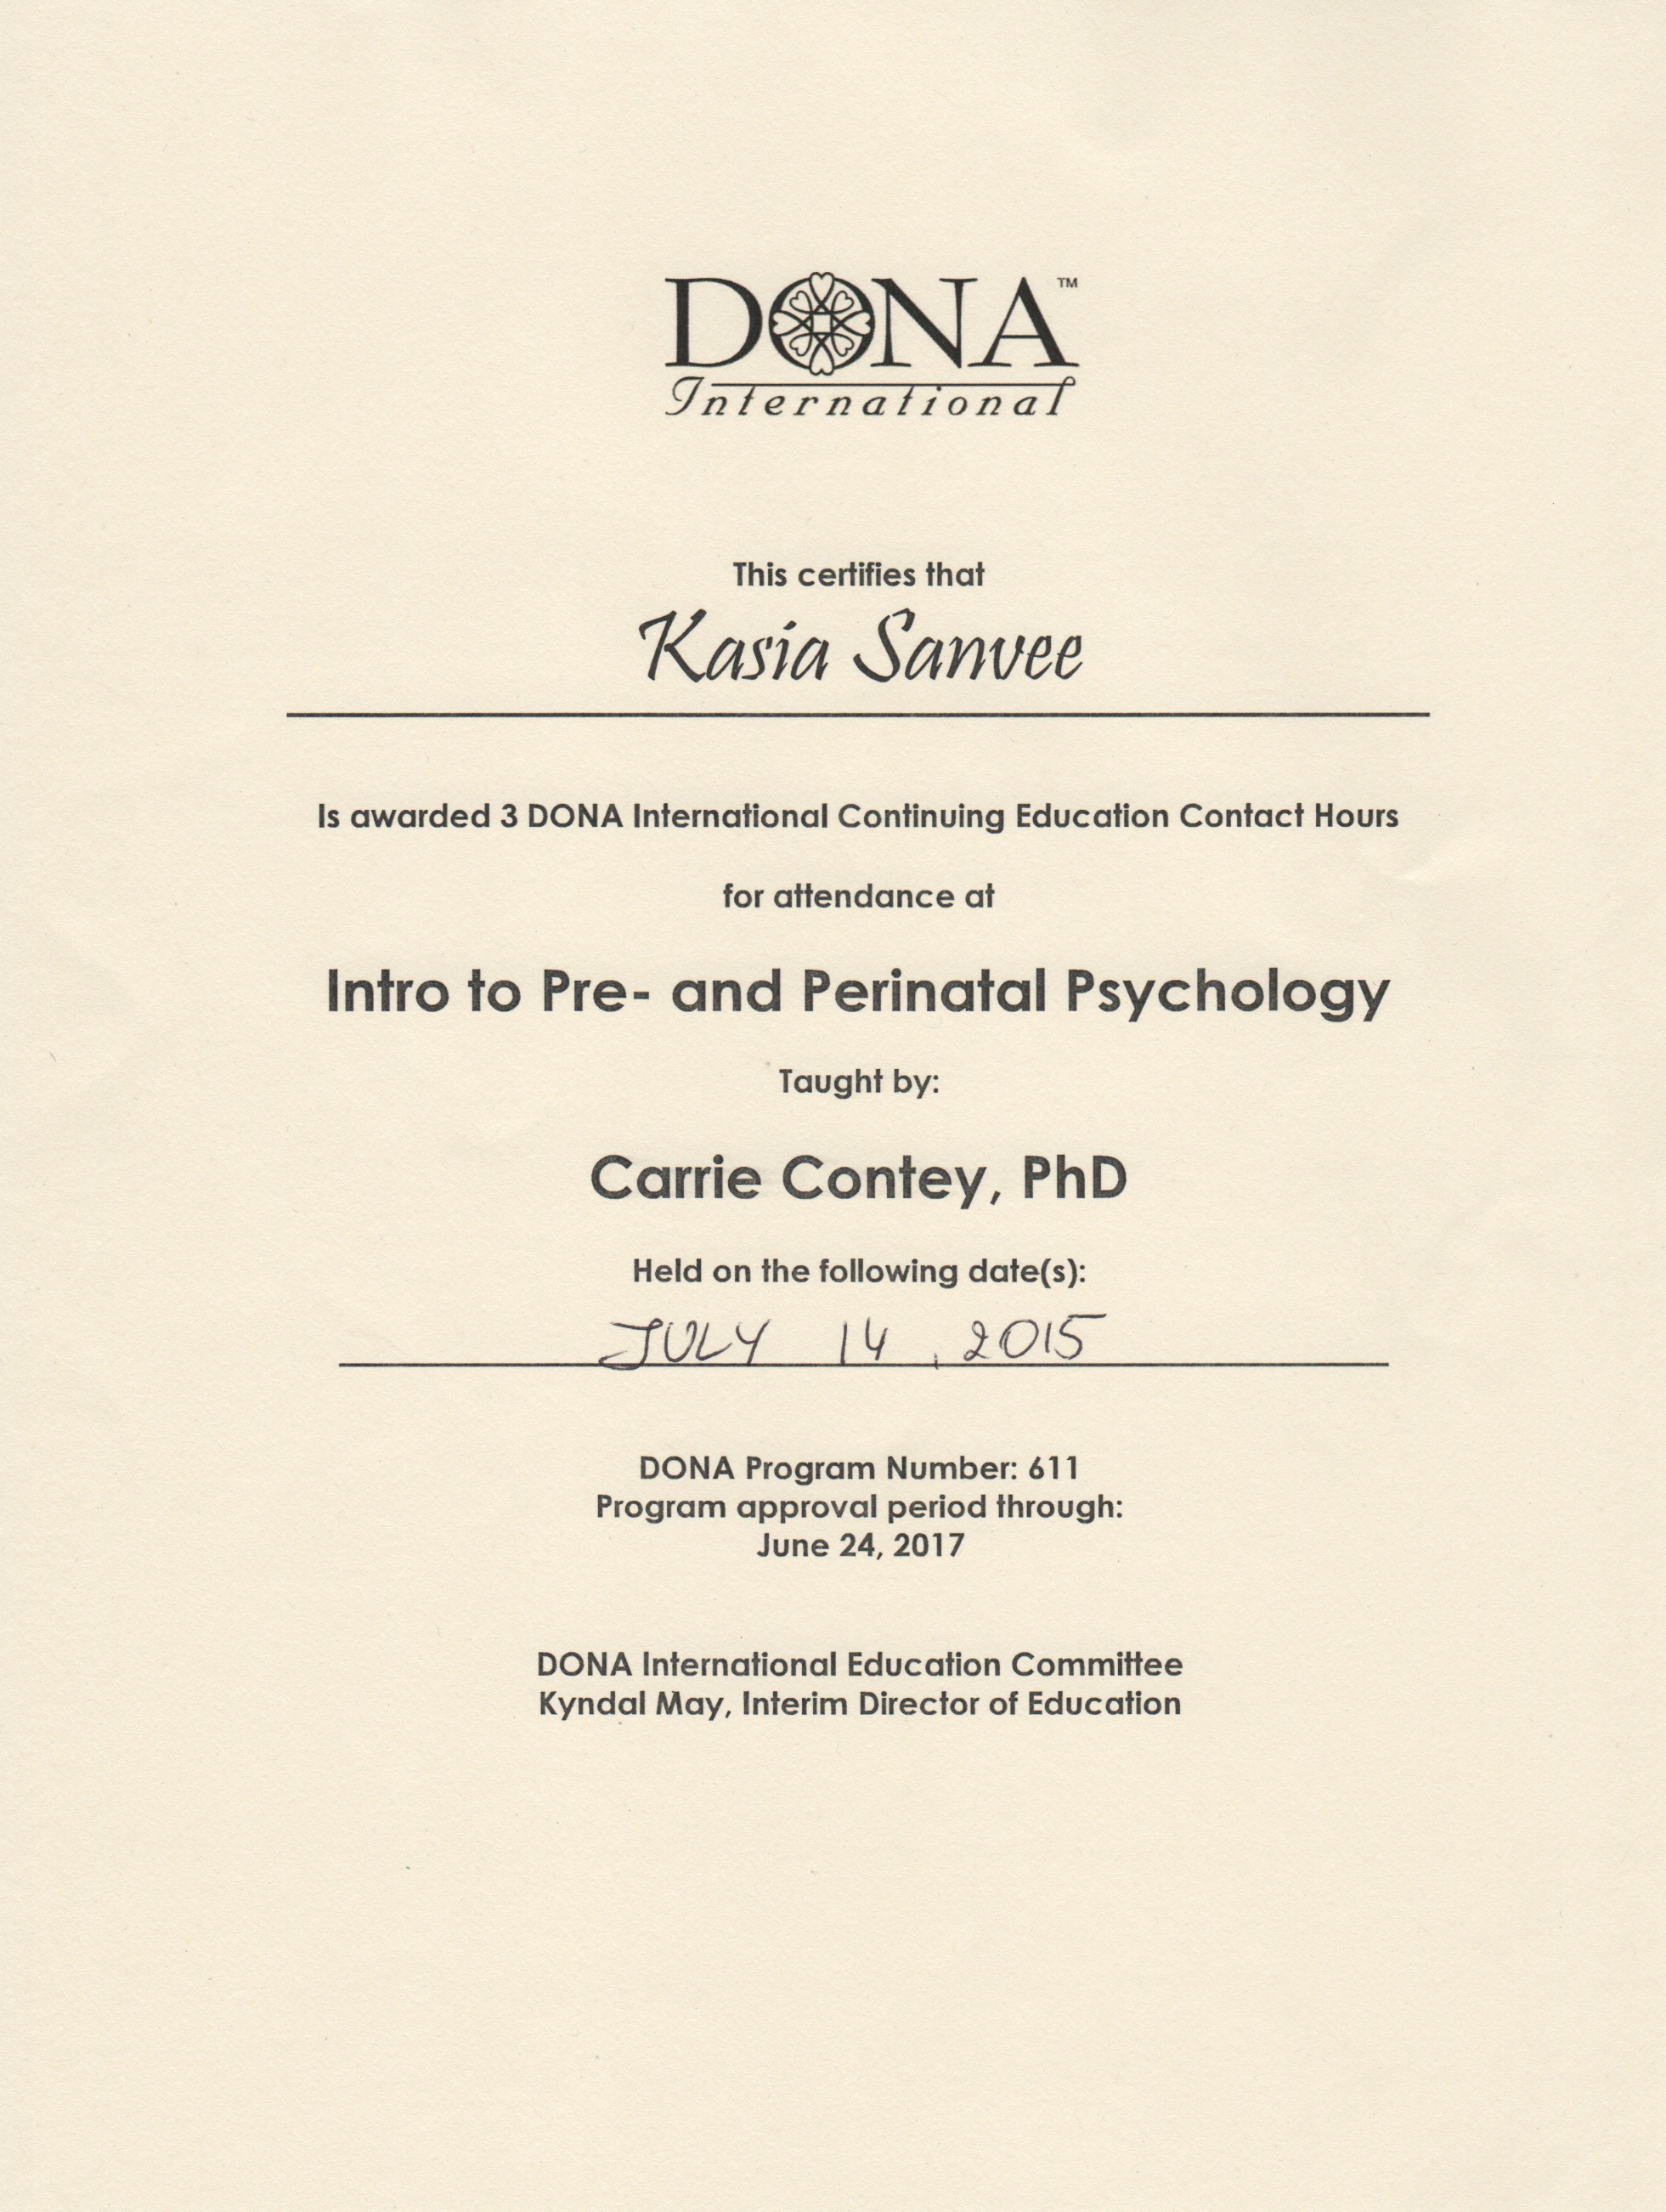 20150714_Perinatal Psychology_Training.jpeg